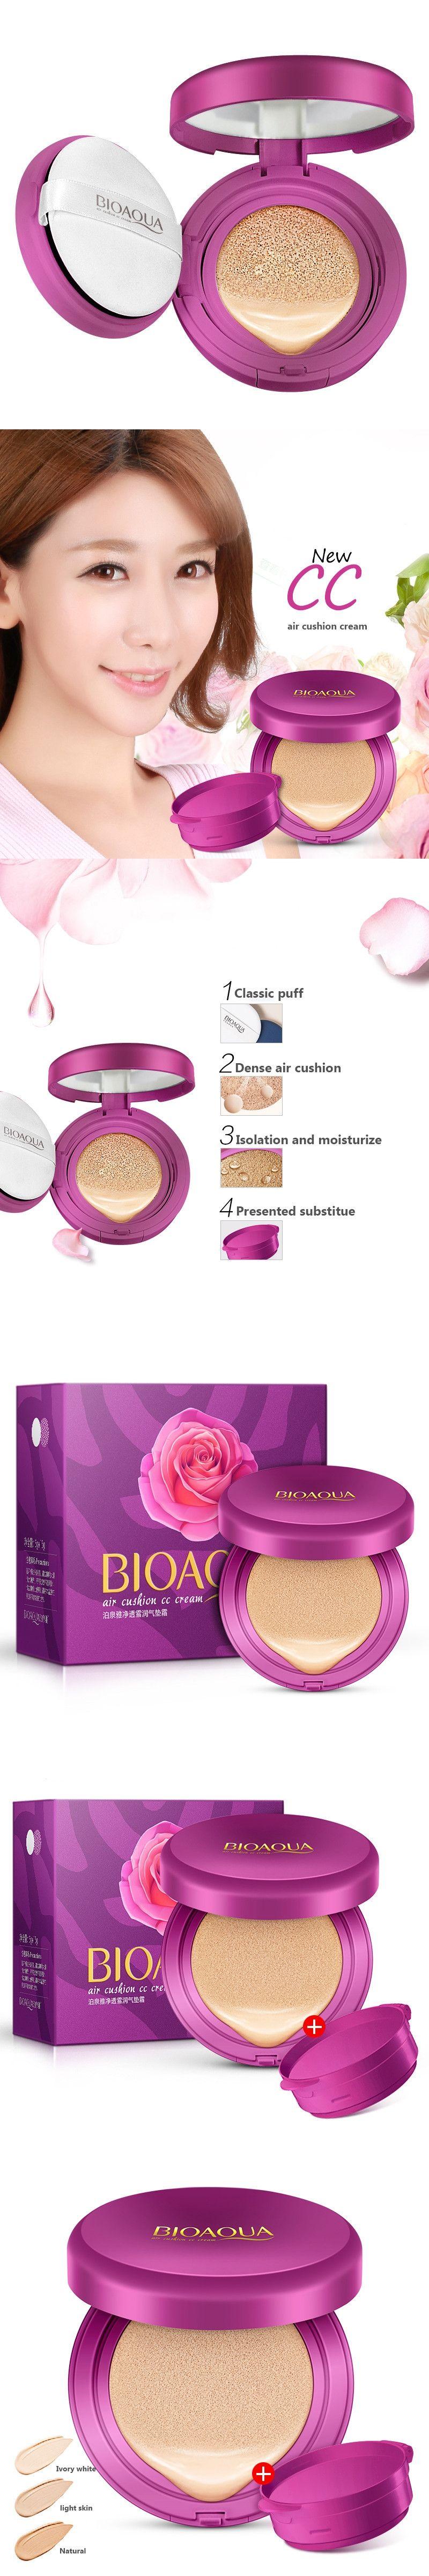 Bioaqua Air Cushion Bb Cream Concealer Moisturizing Foundation Bio Aqua Aircusion Makeup Whitening Brighten Face Beauty Cosmetic